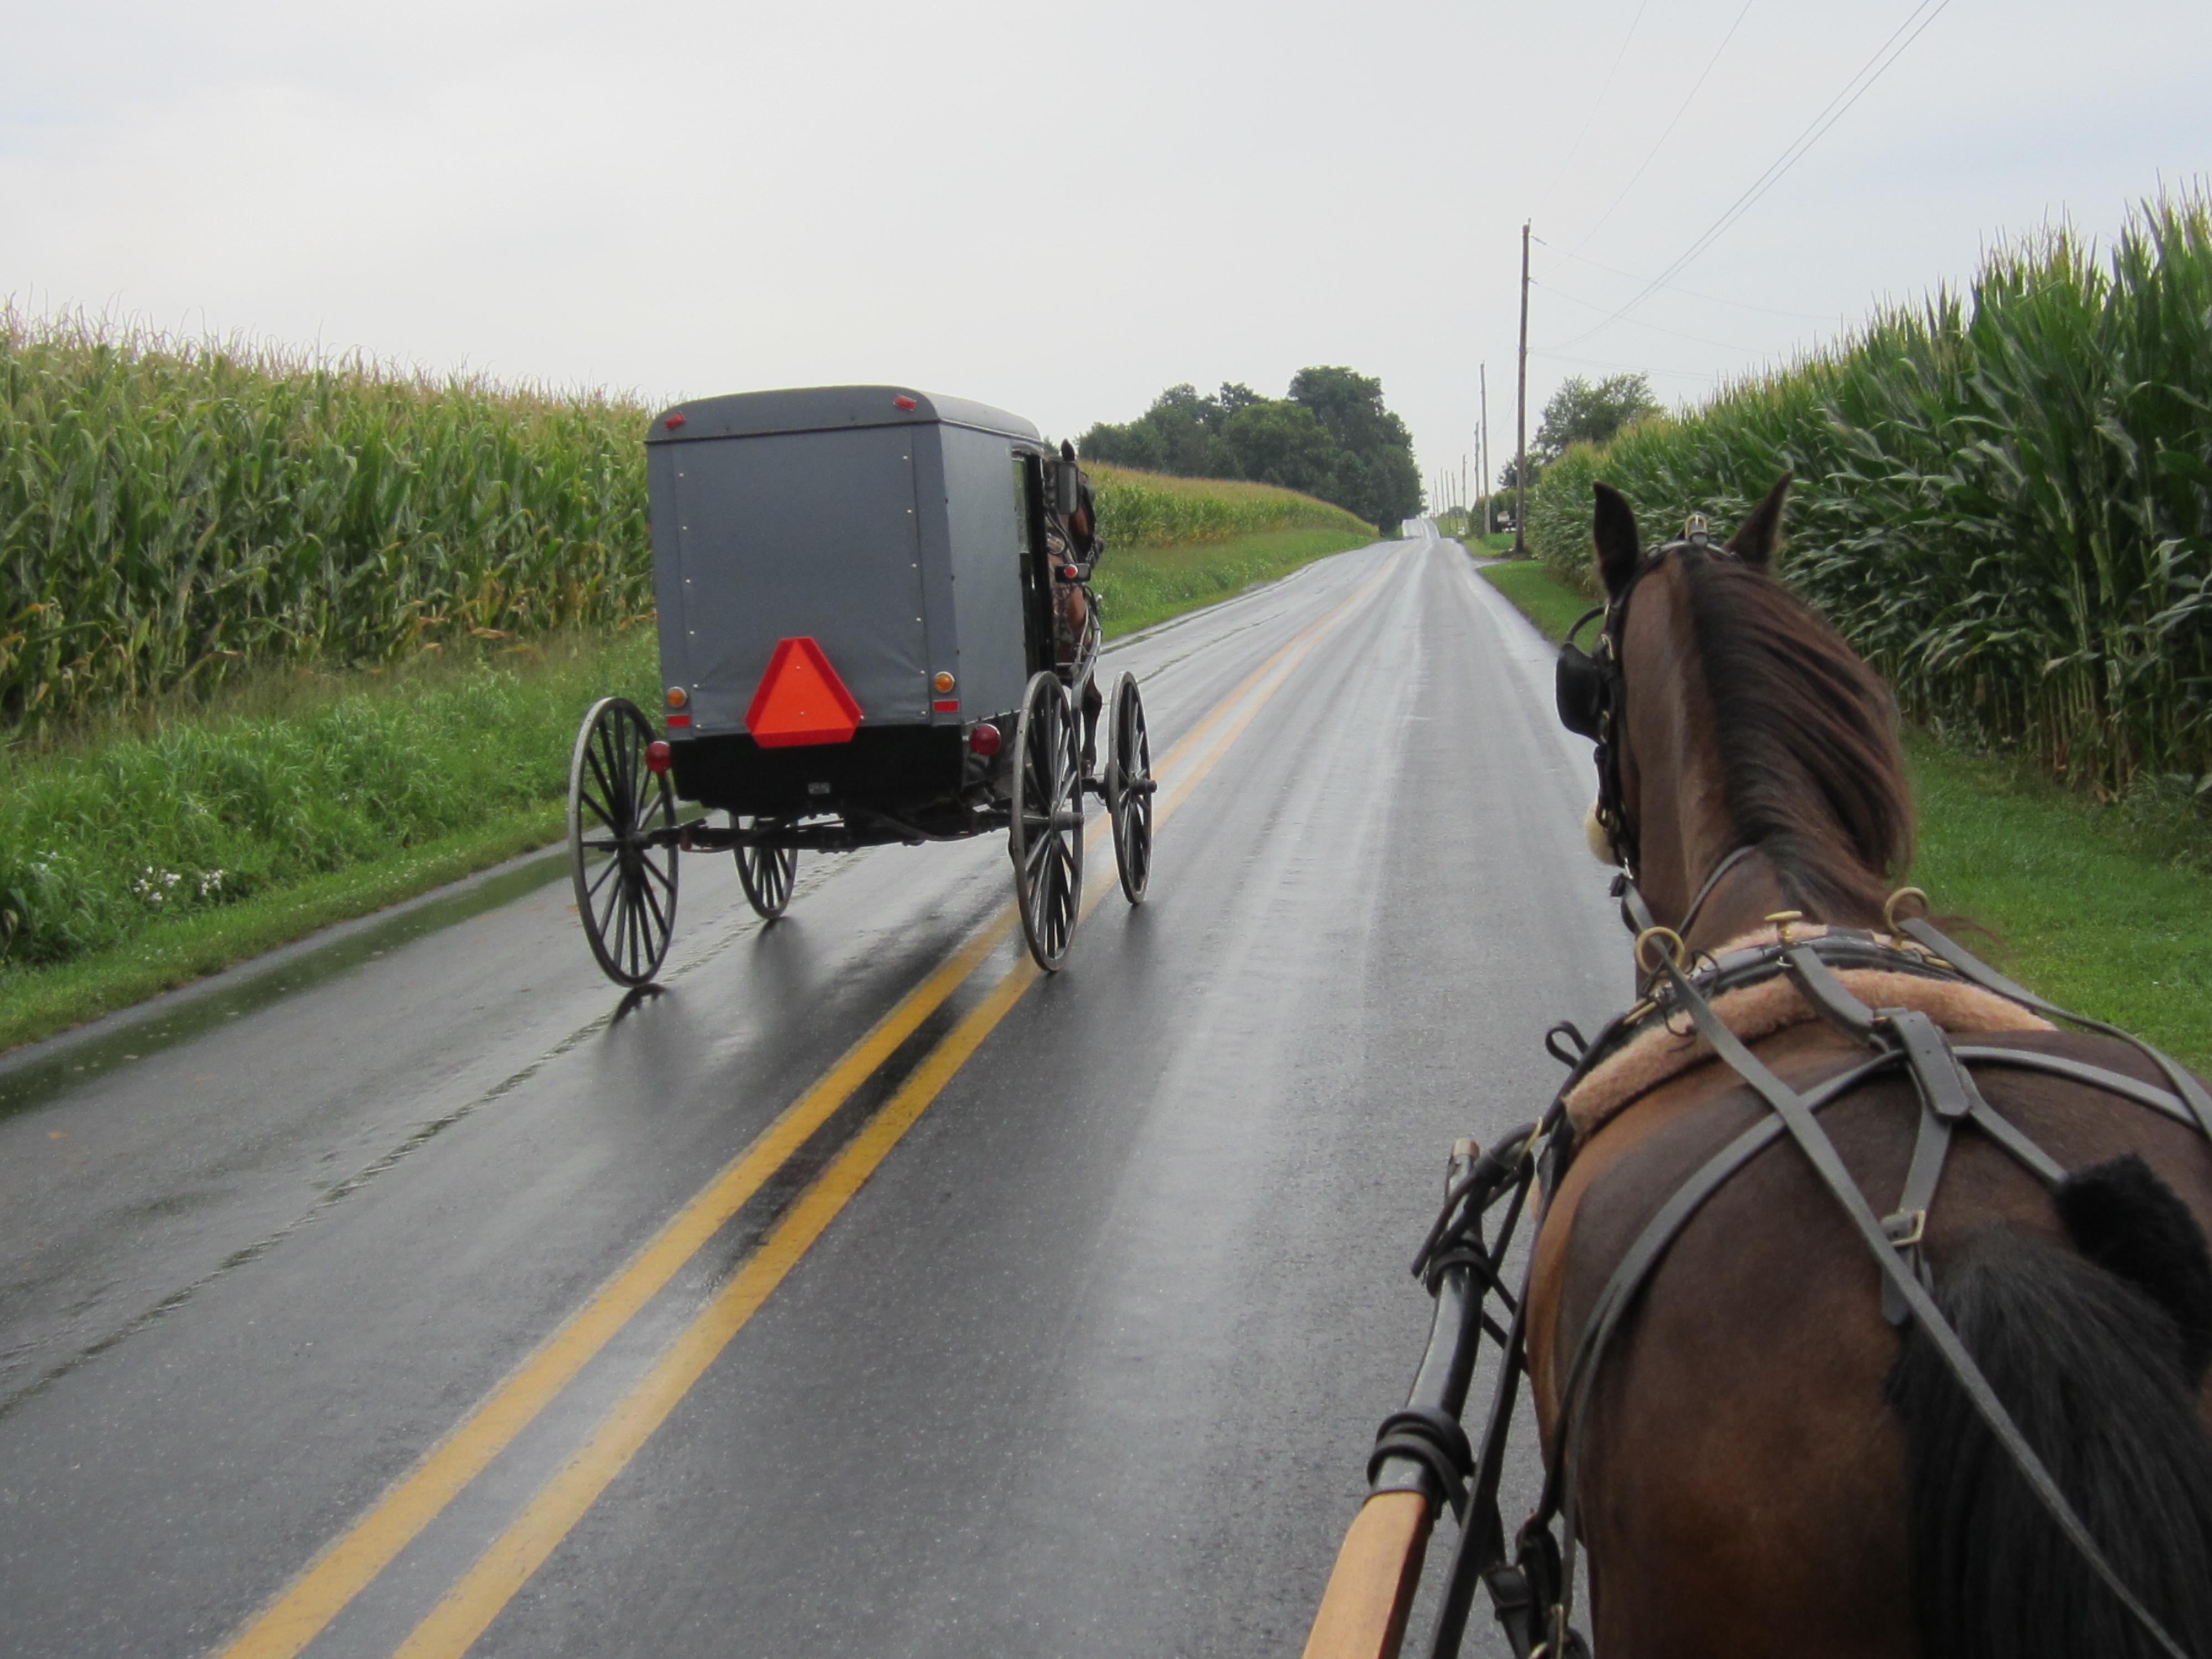 Amish_Horse_Susan_Meissner